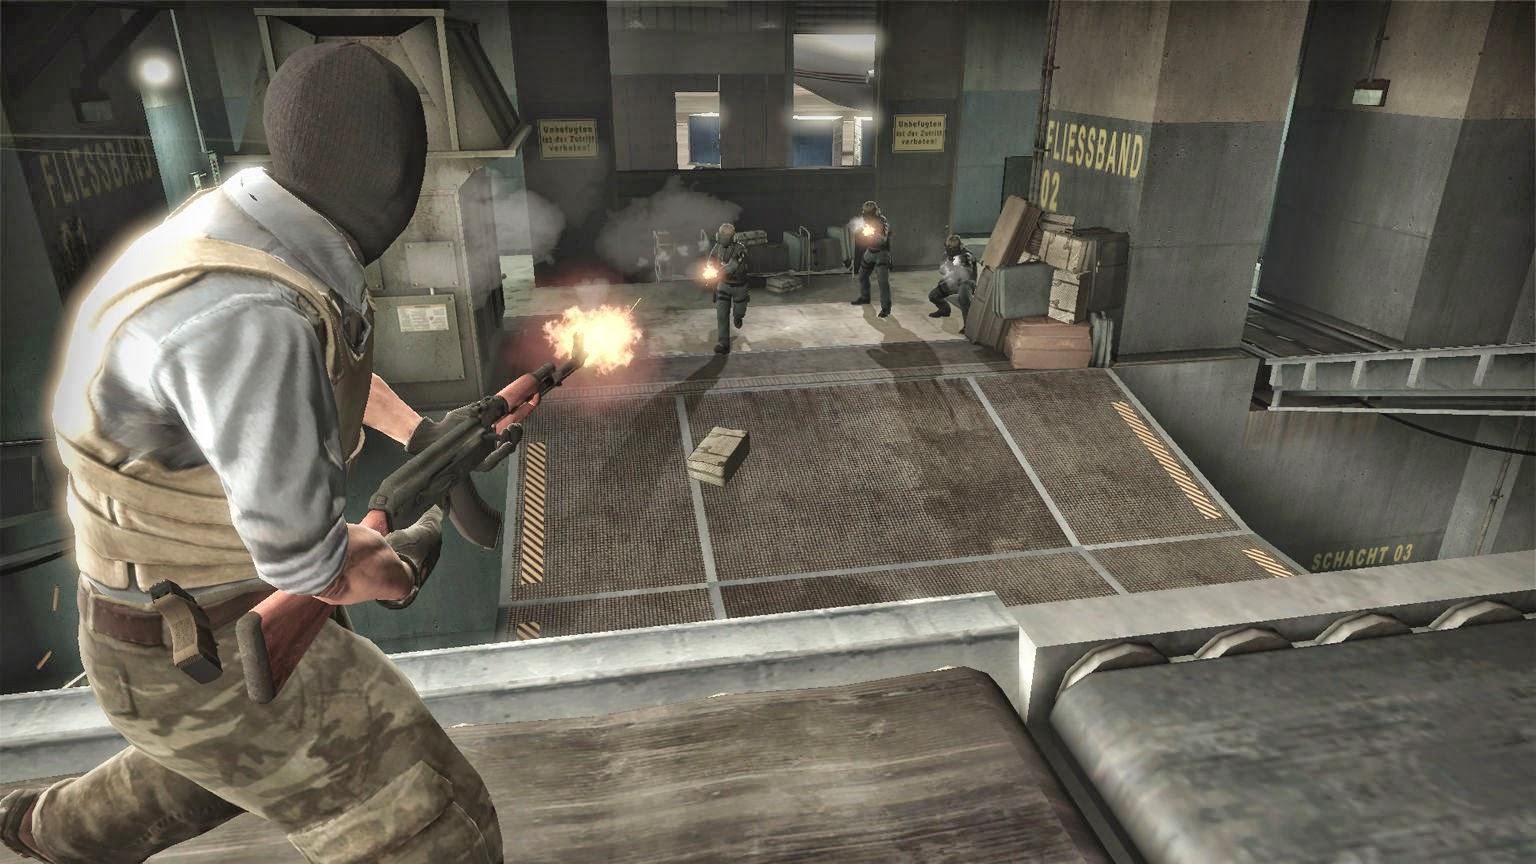 تحميل لعبة الأكشن و الإثارة Counter-Strike Global Offensive Ss_74c1a0264ceaf57e5fb51d978205045223b48a18.1920x1080